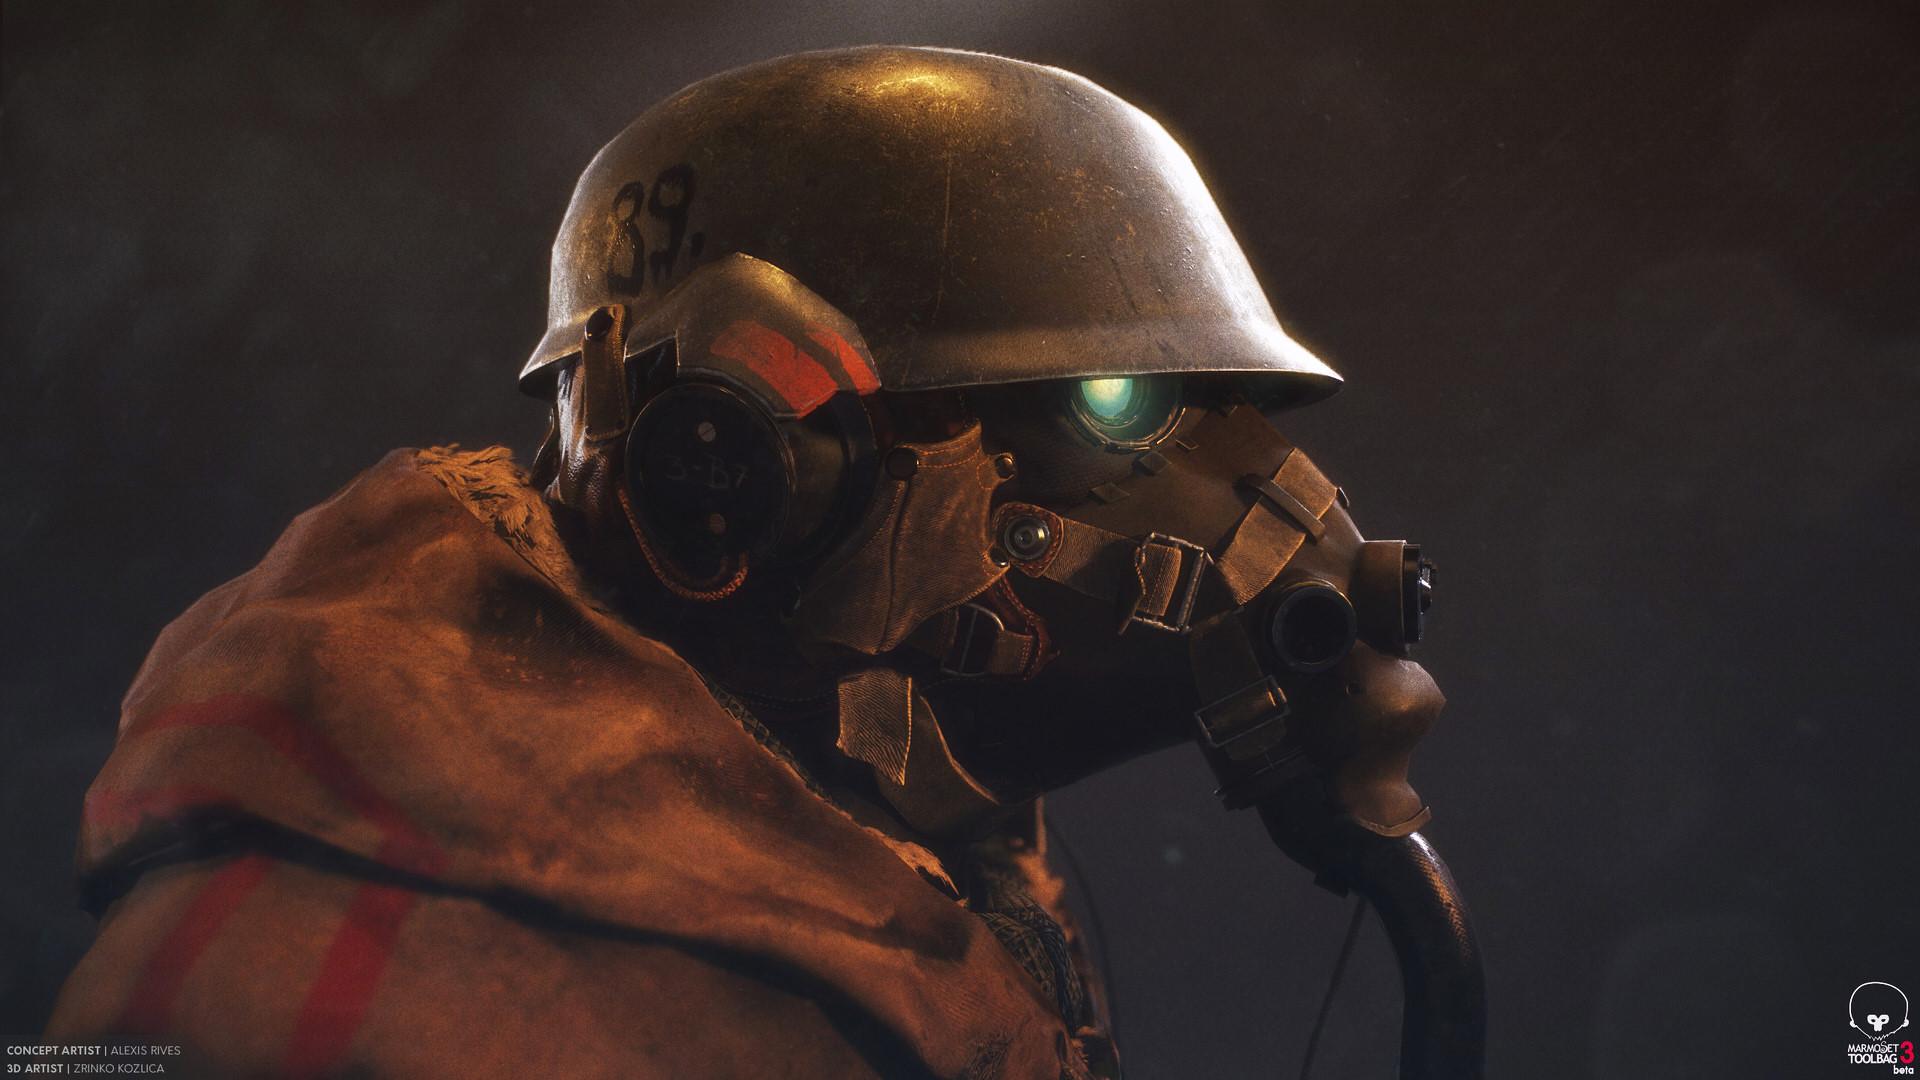 zrinko-kozlica-helmet-screenshot012-2k